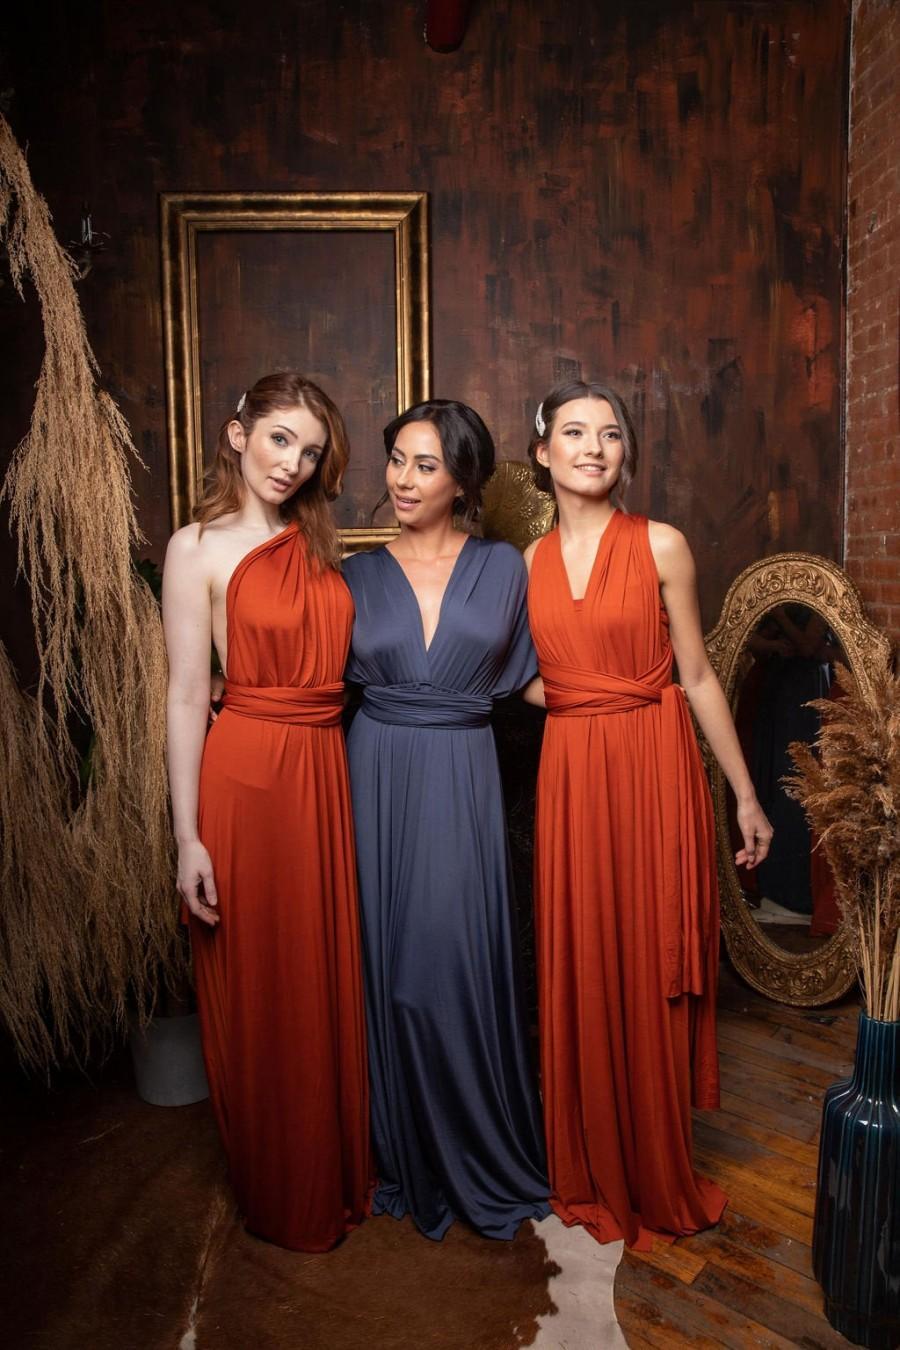 Wedding - Infinity Dress With Bandeau, Convertible Dress, Bridesmaid Dress, Long  Dress Plus Size, Multi-way Dress,  Wrap Dress